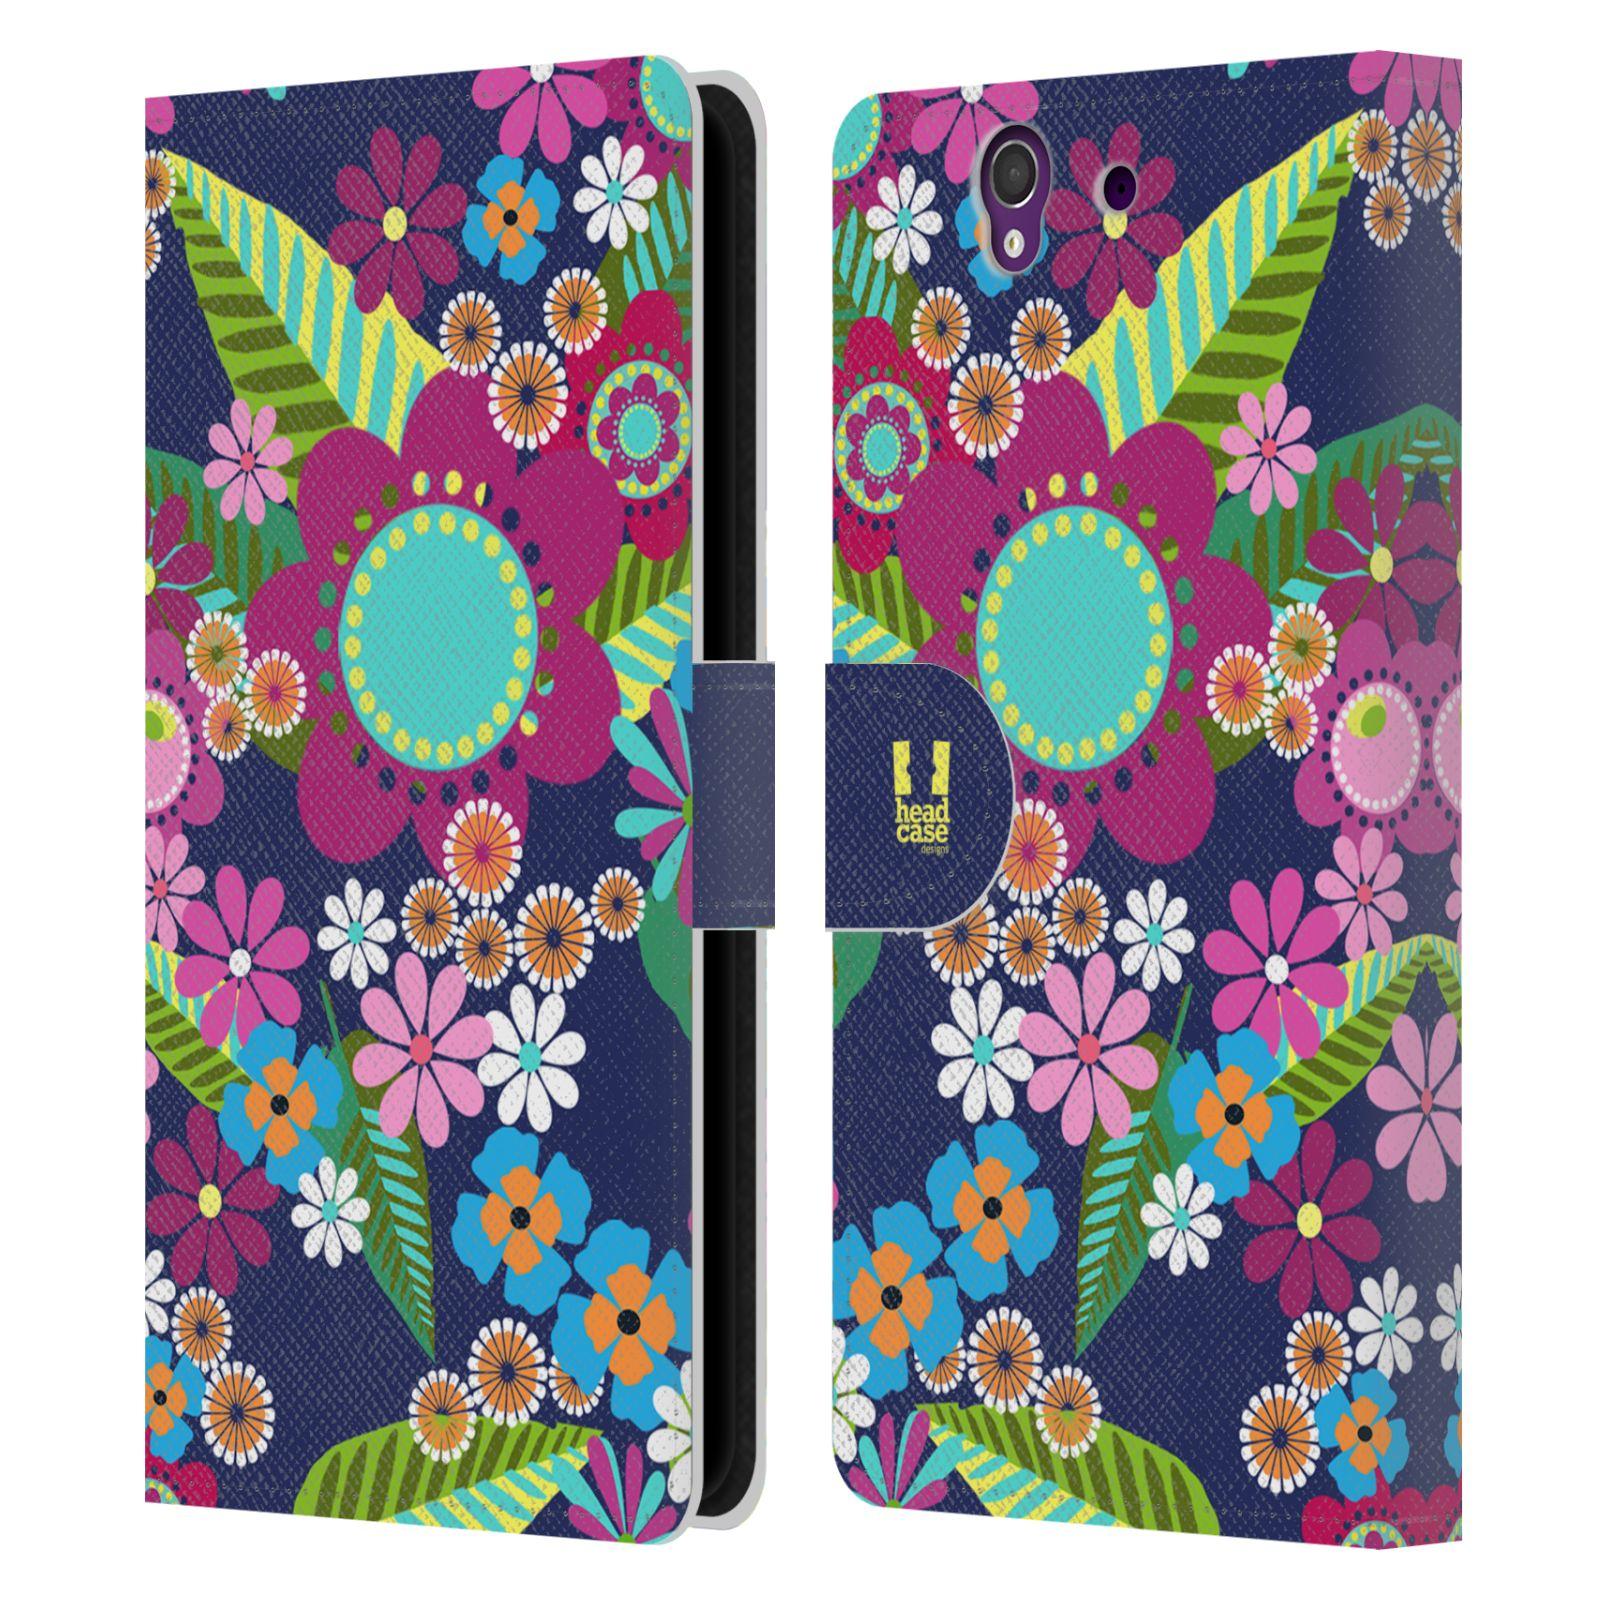 HEAD CASE Flipové pouzdro pro mobil SONY XPERIA Z (C6603) BOTANIKA barevné květy modrá